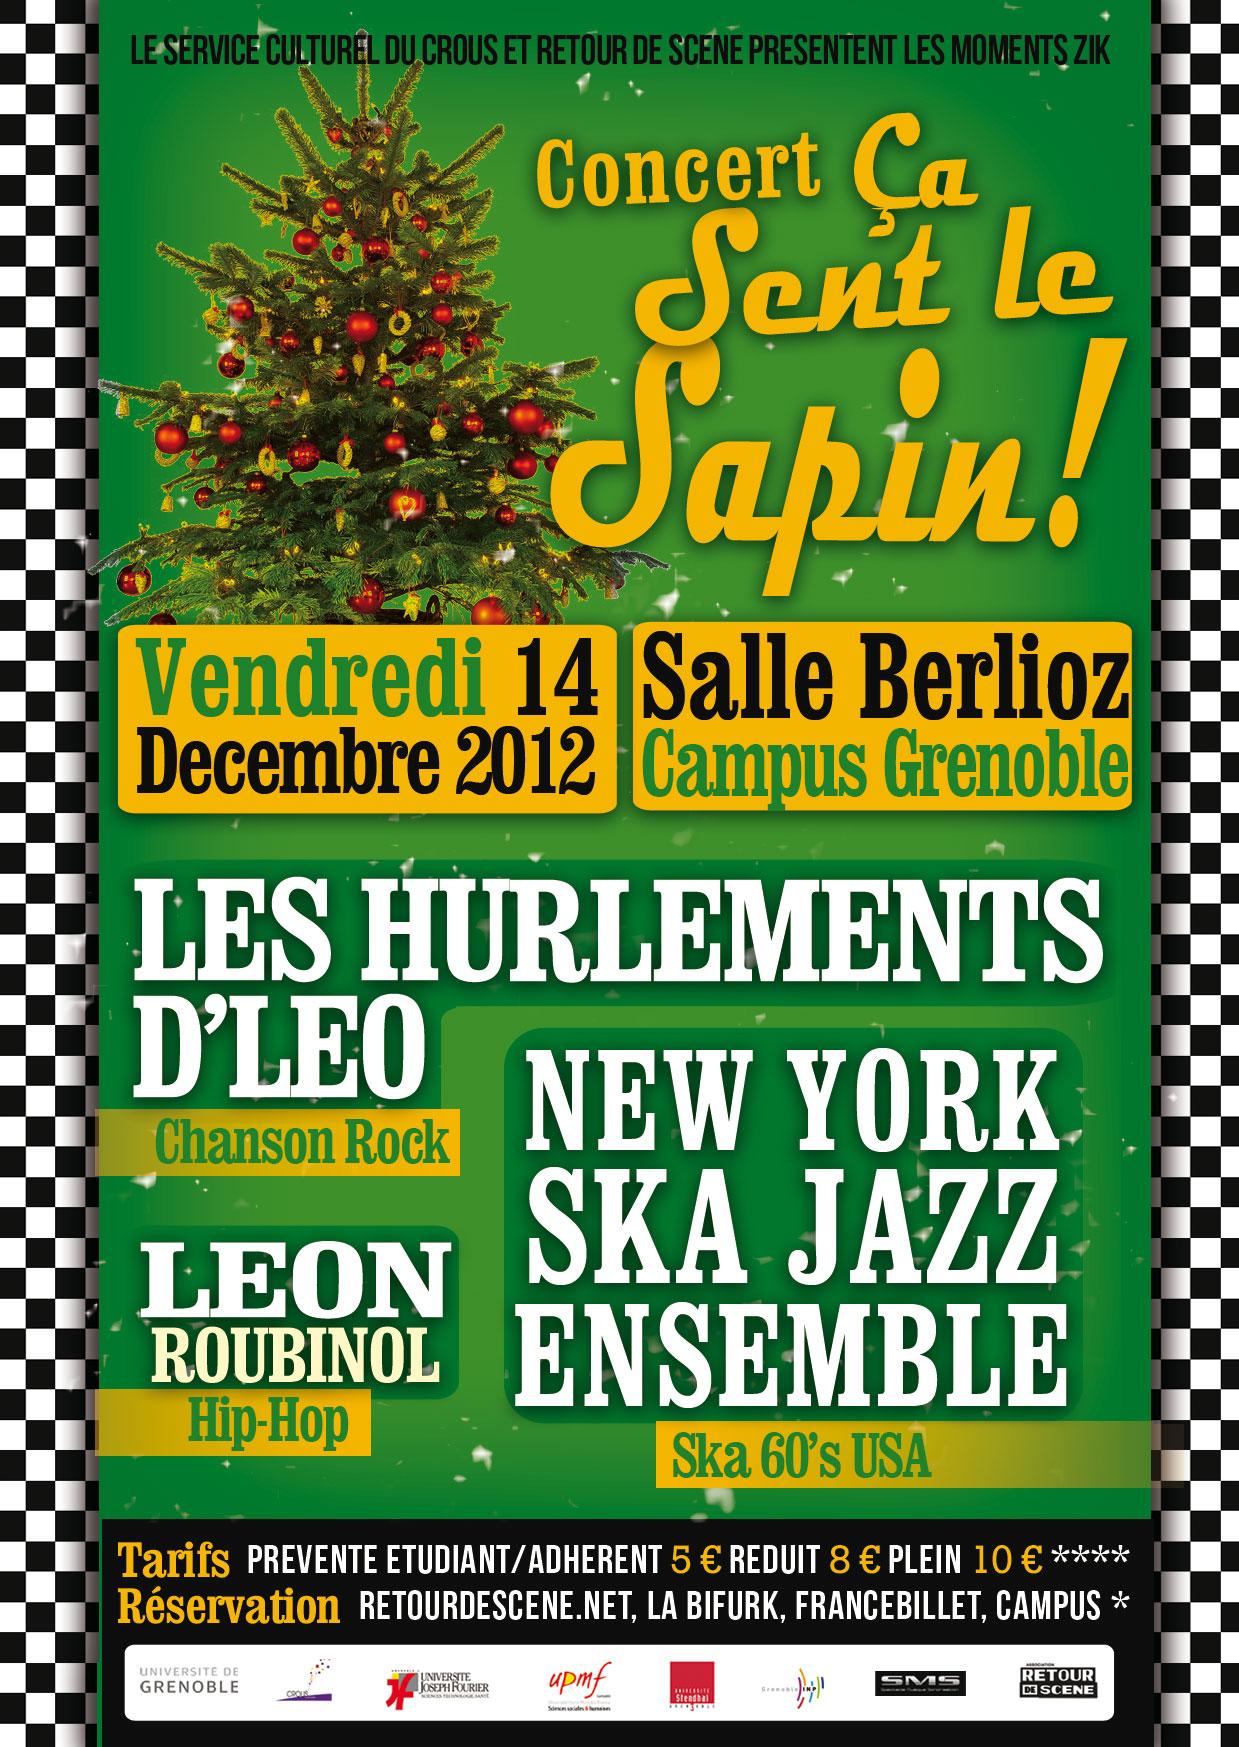 ça sent le sapin - Berlioz - 14/12/2012